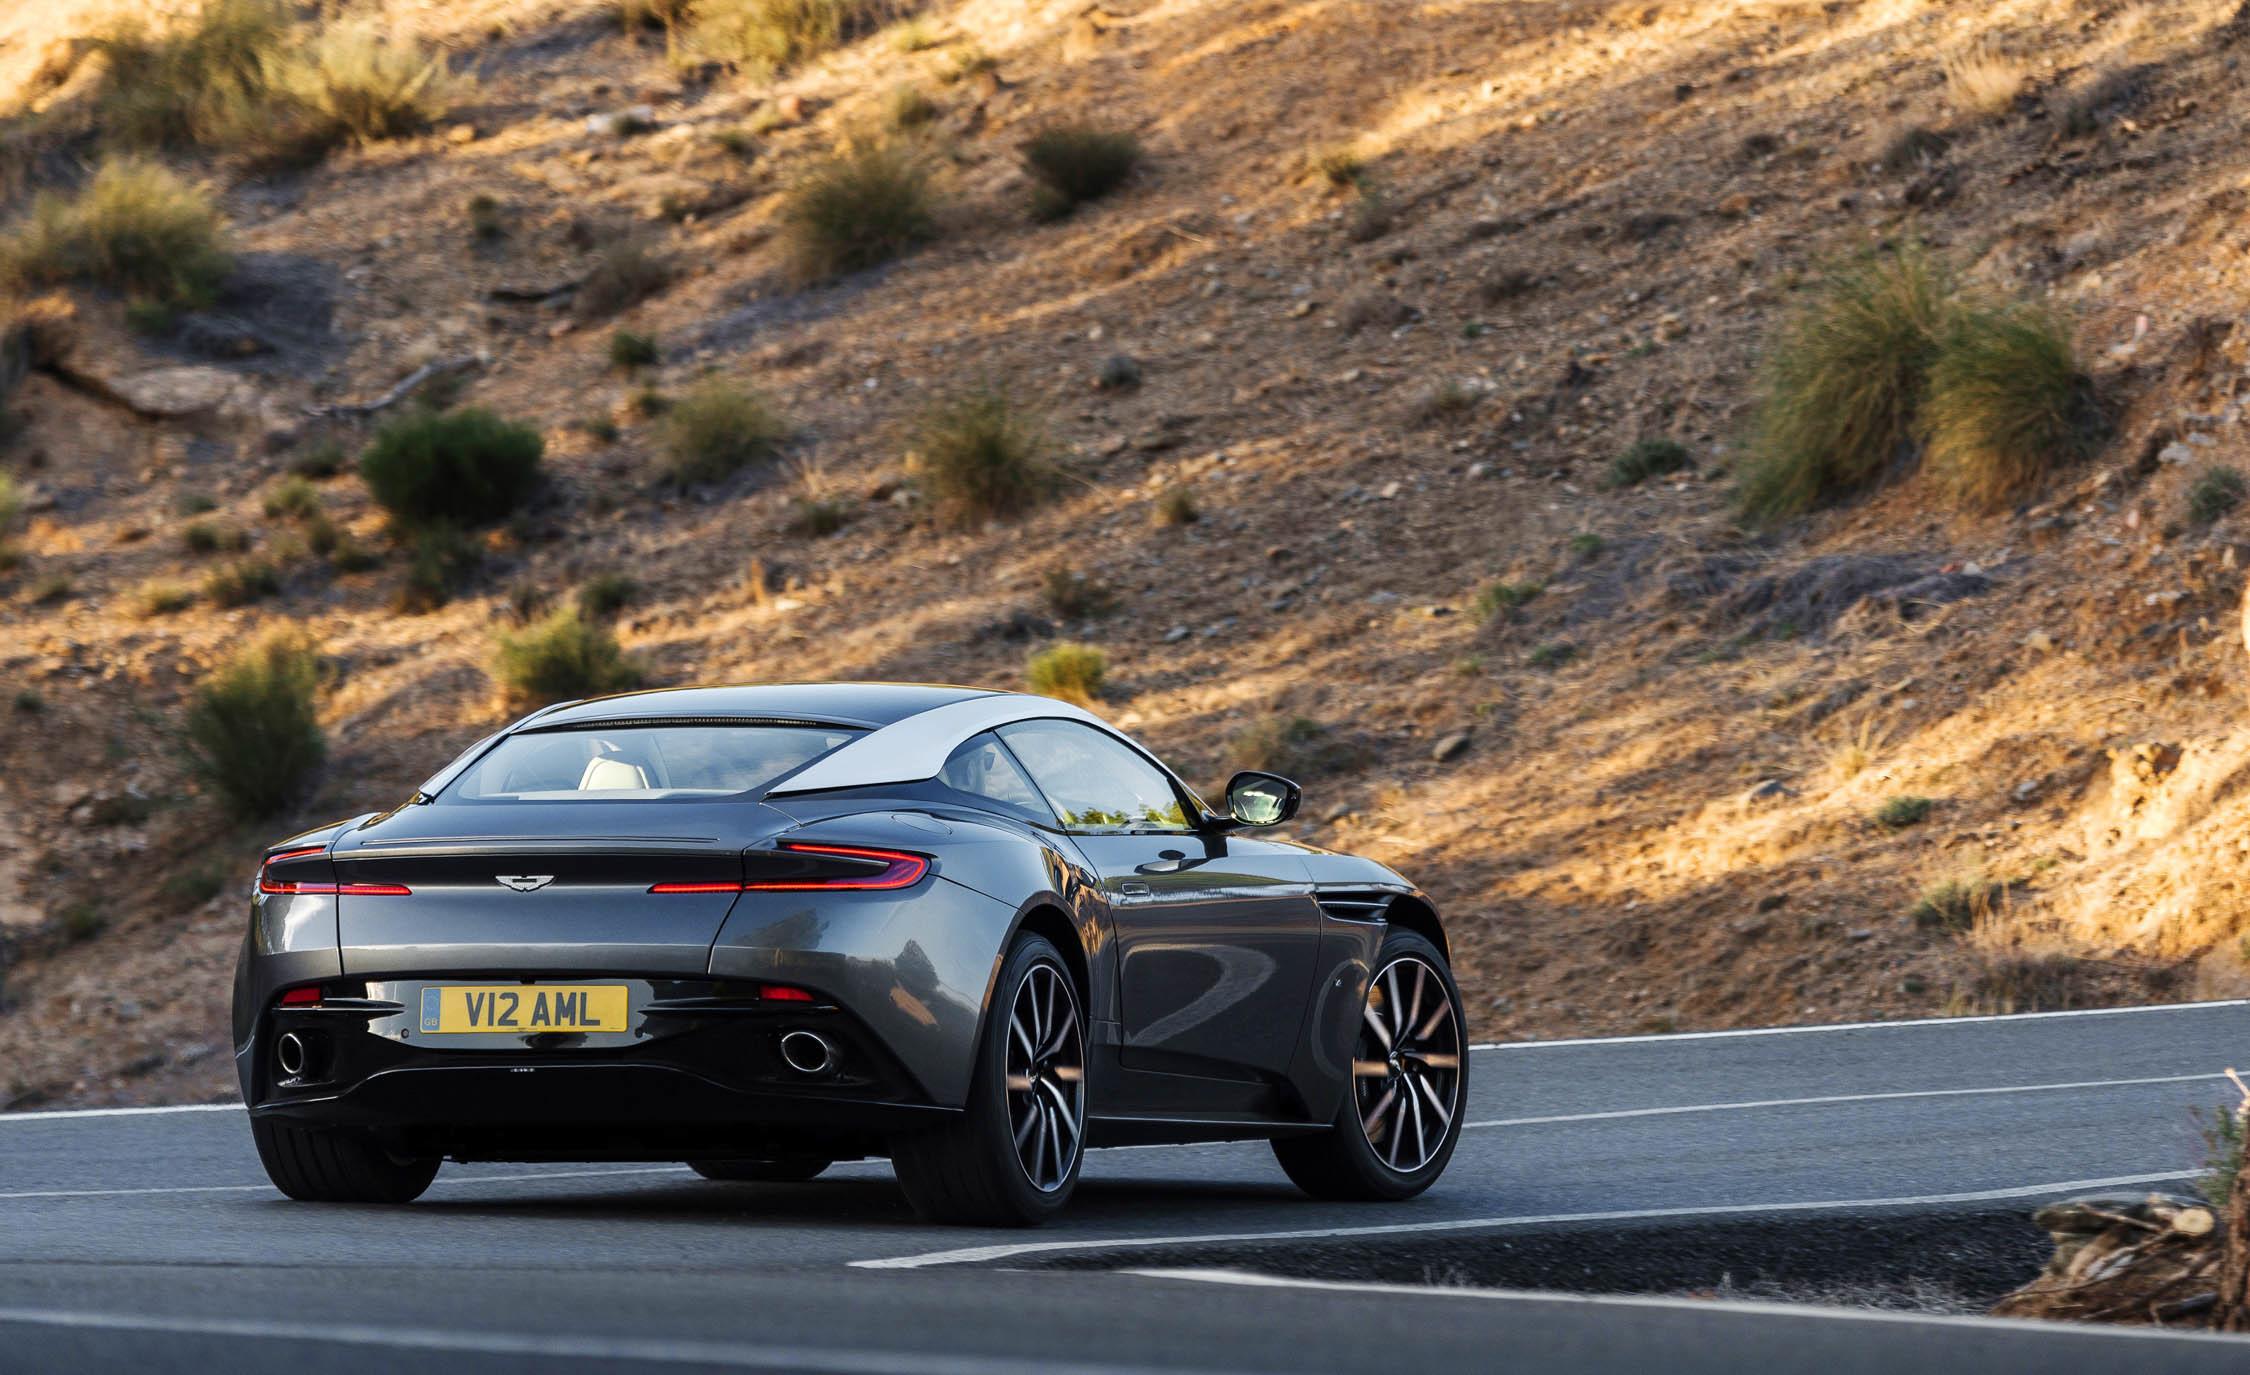 2017 Aston Martin Db11 Test Drive Rear View (View 10 of 22)